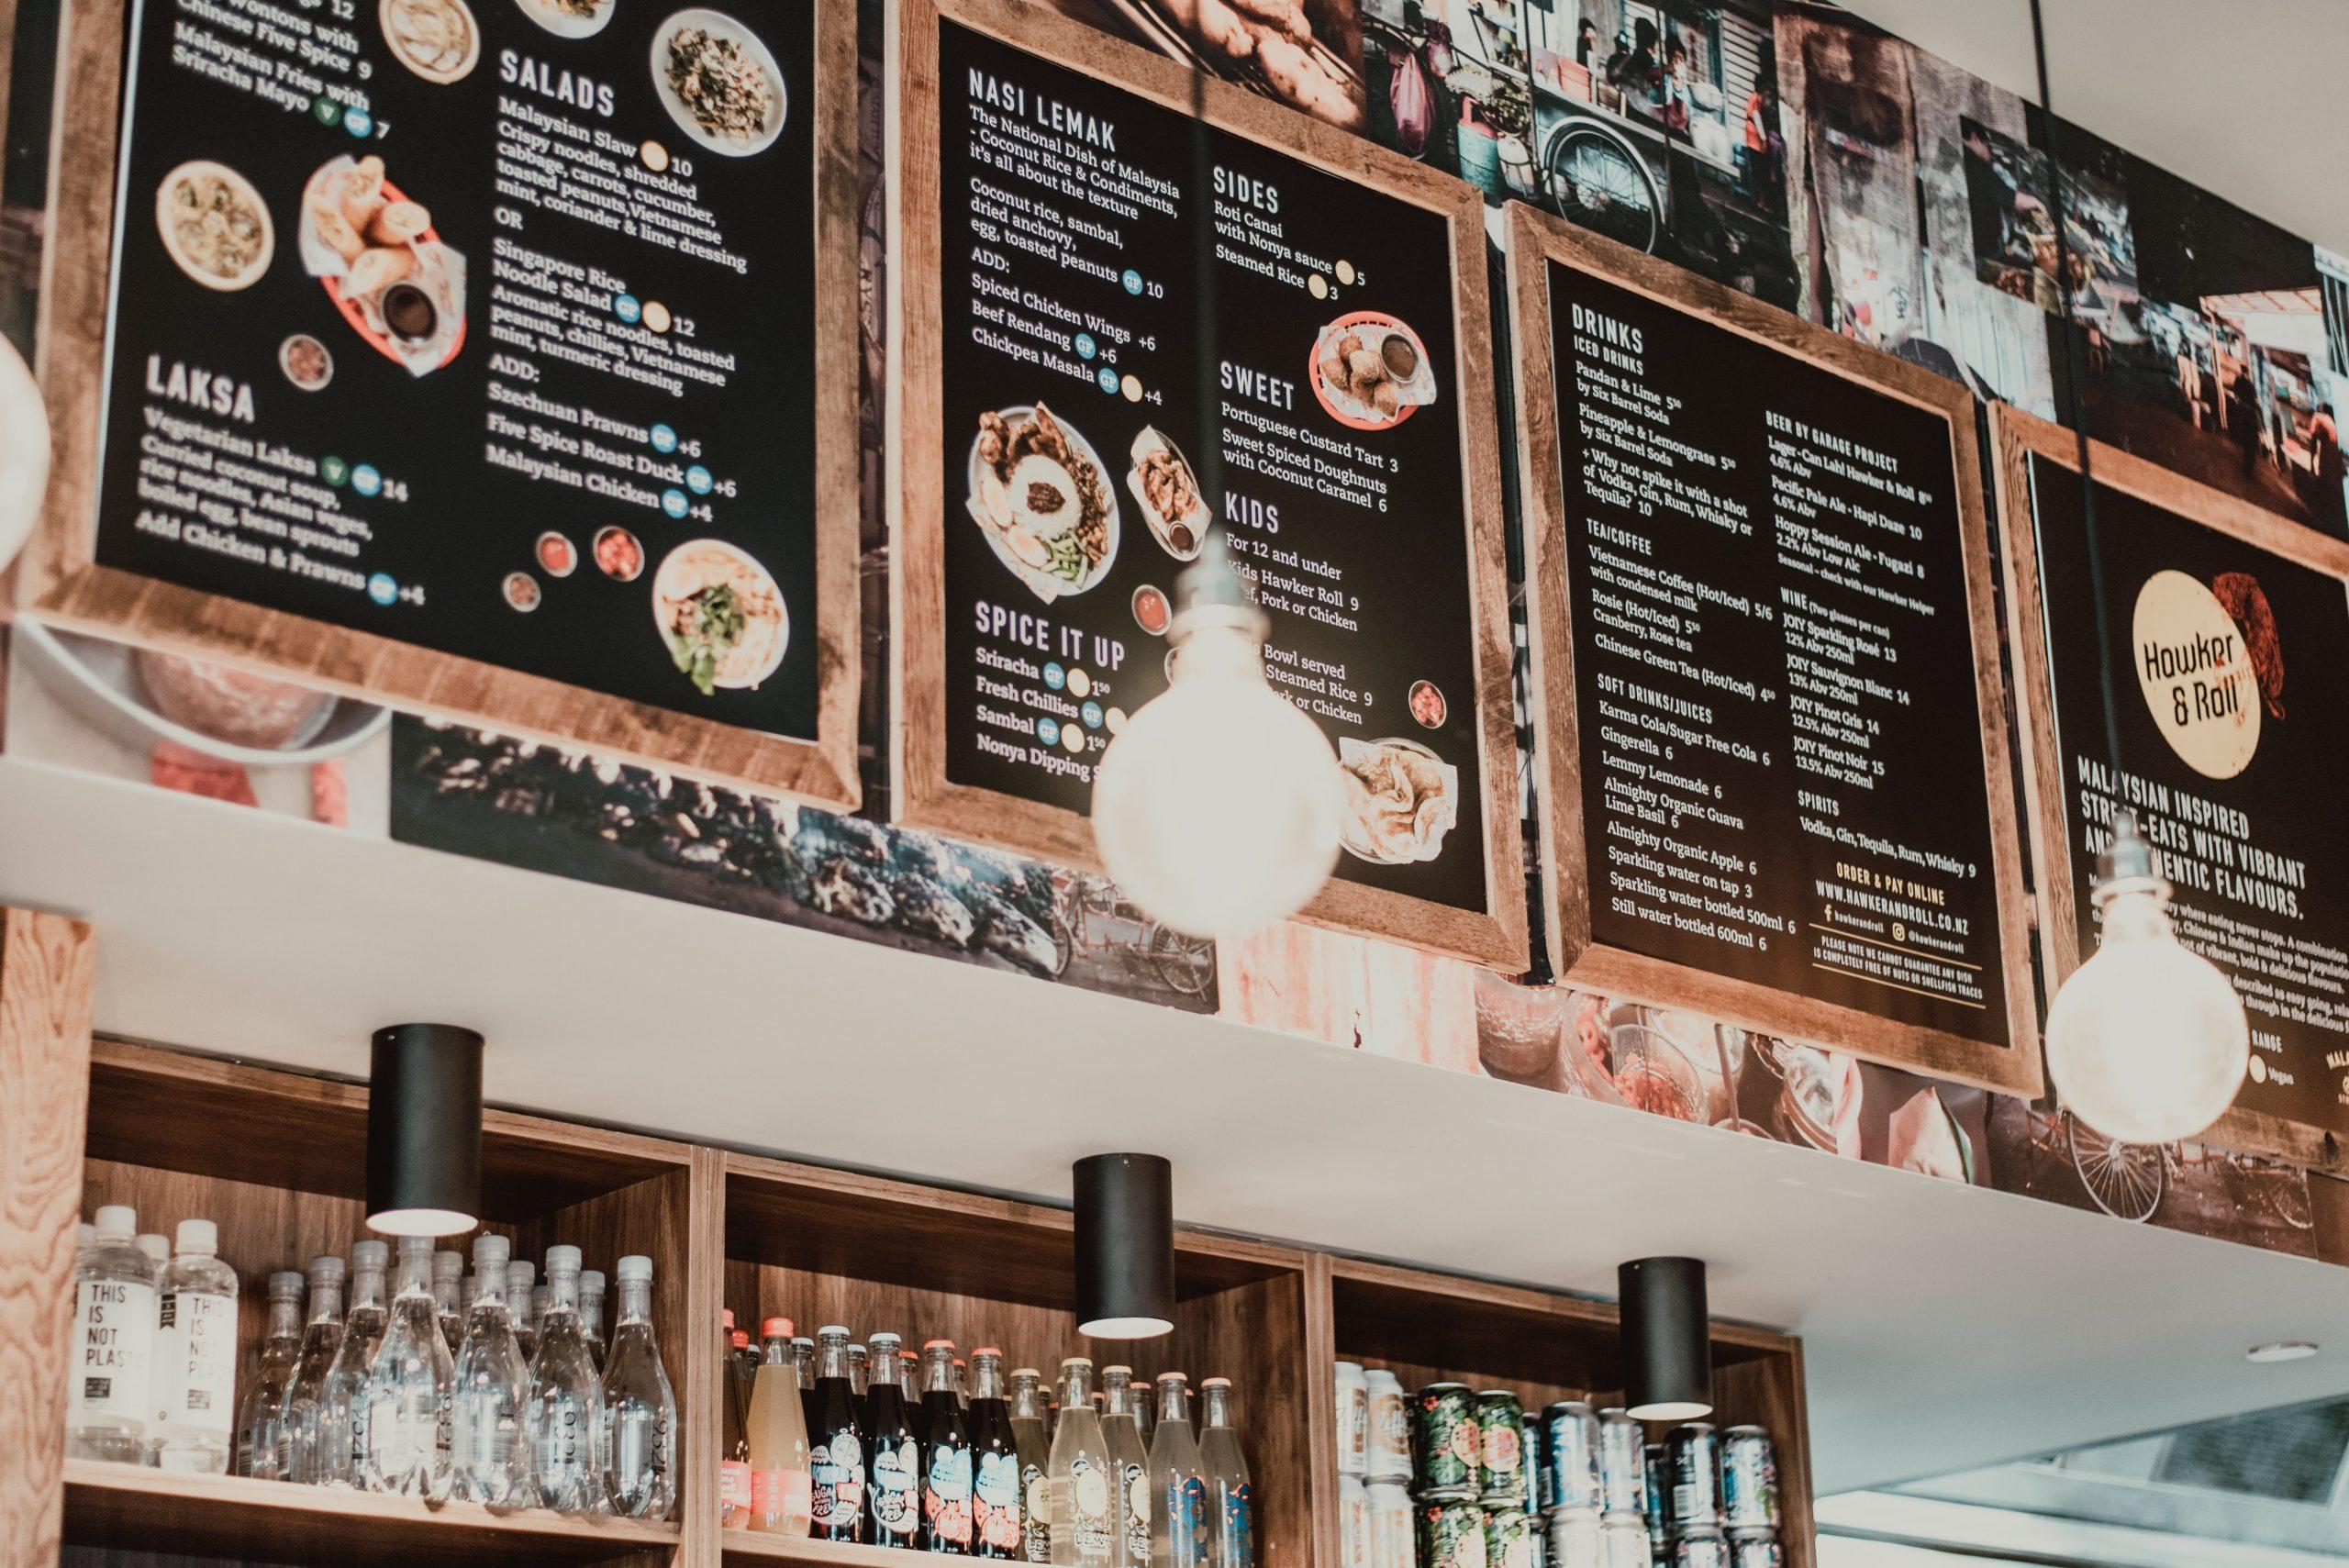 Does Restaurant Menu Design Matter?